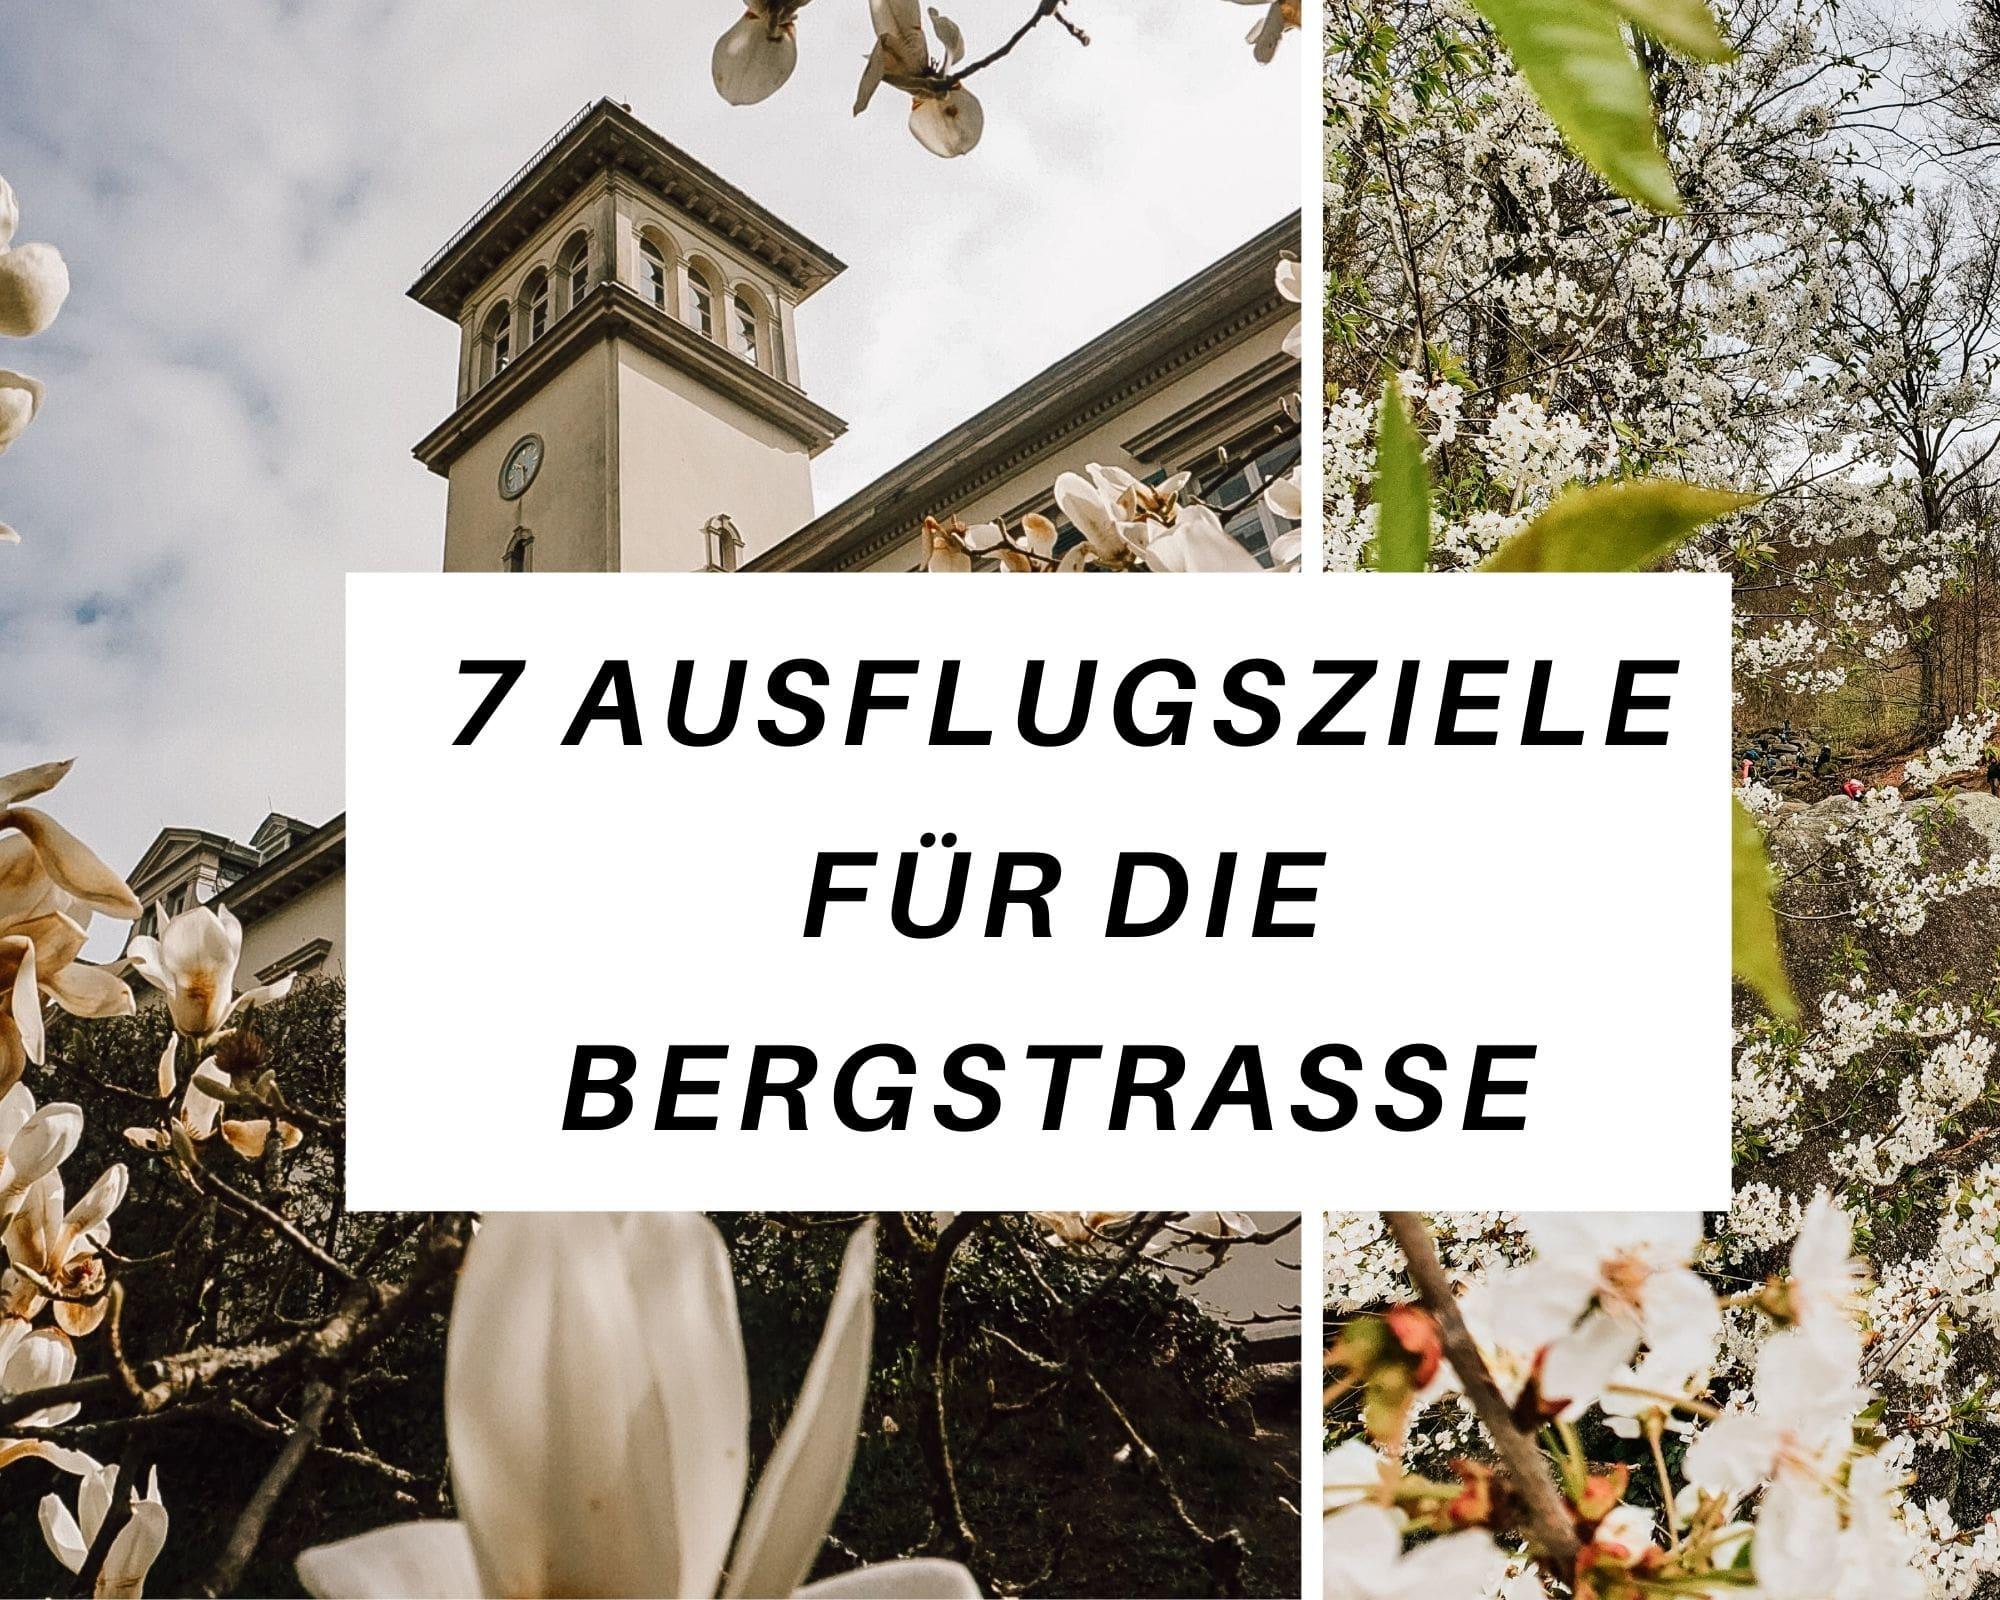 Ausflugsziele in der Bergstraße in Hessen